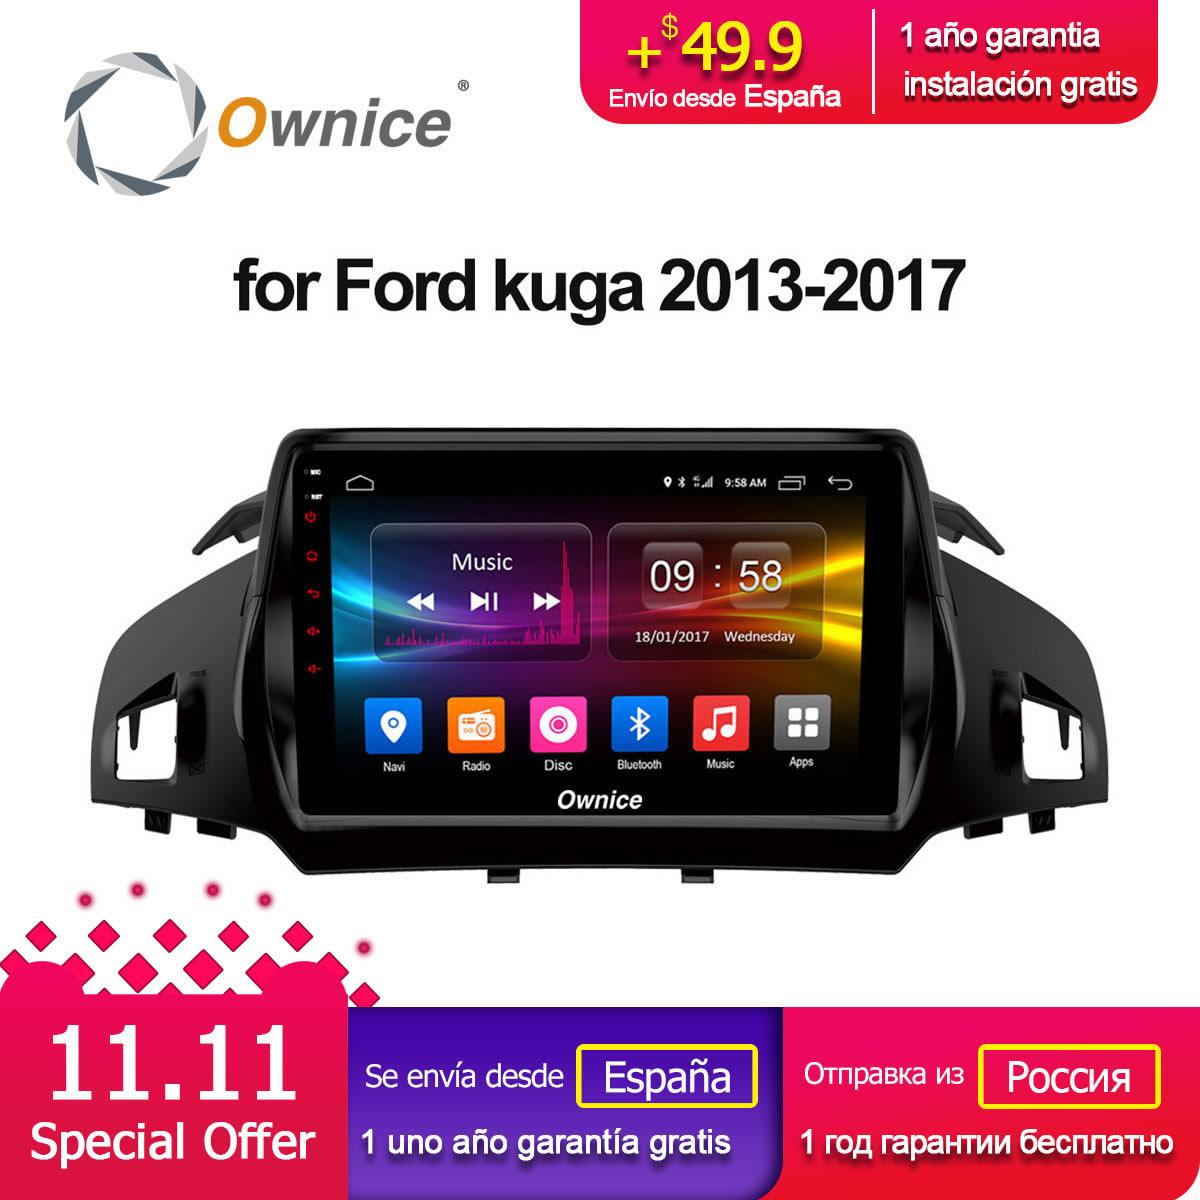 Ownice C500+ G10 Octa eight Core Android 8.1 Car Radio player gps Navi for Ford Kuga 2013 - 2015 2GB RAM 32GB ROM support 4G ownice c500 android 6 0 octa 8 core car dvd player for suzuki grand vitara android 6 0 wifi 4g gps bt radio 2gb ram 32gb rom